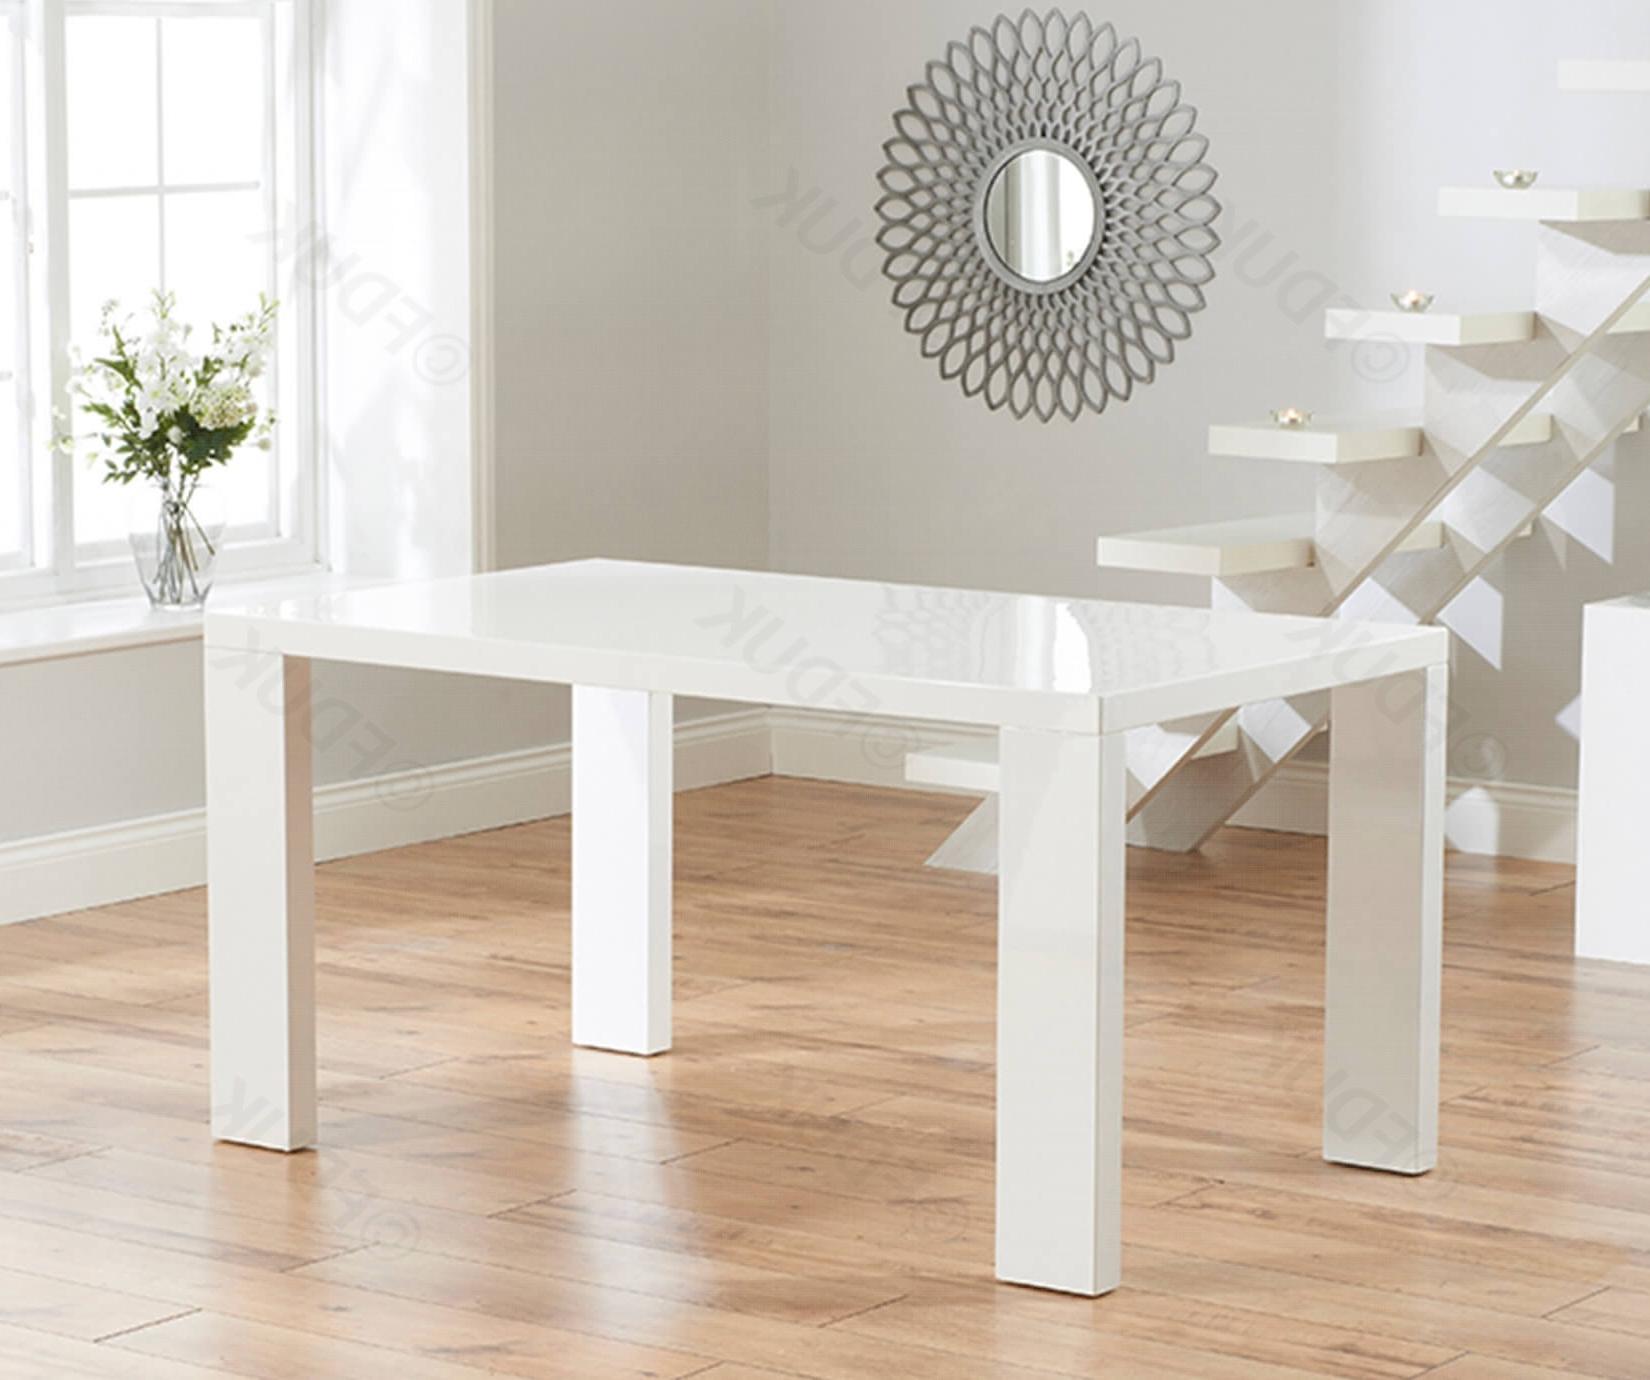 Metz 150Cm White High Gloss Dining Table For White High Gloss Dining Chairs (View 24 of 25)